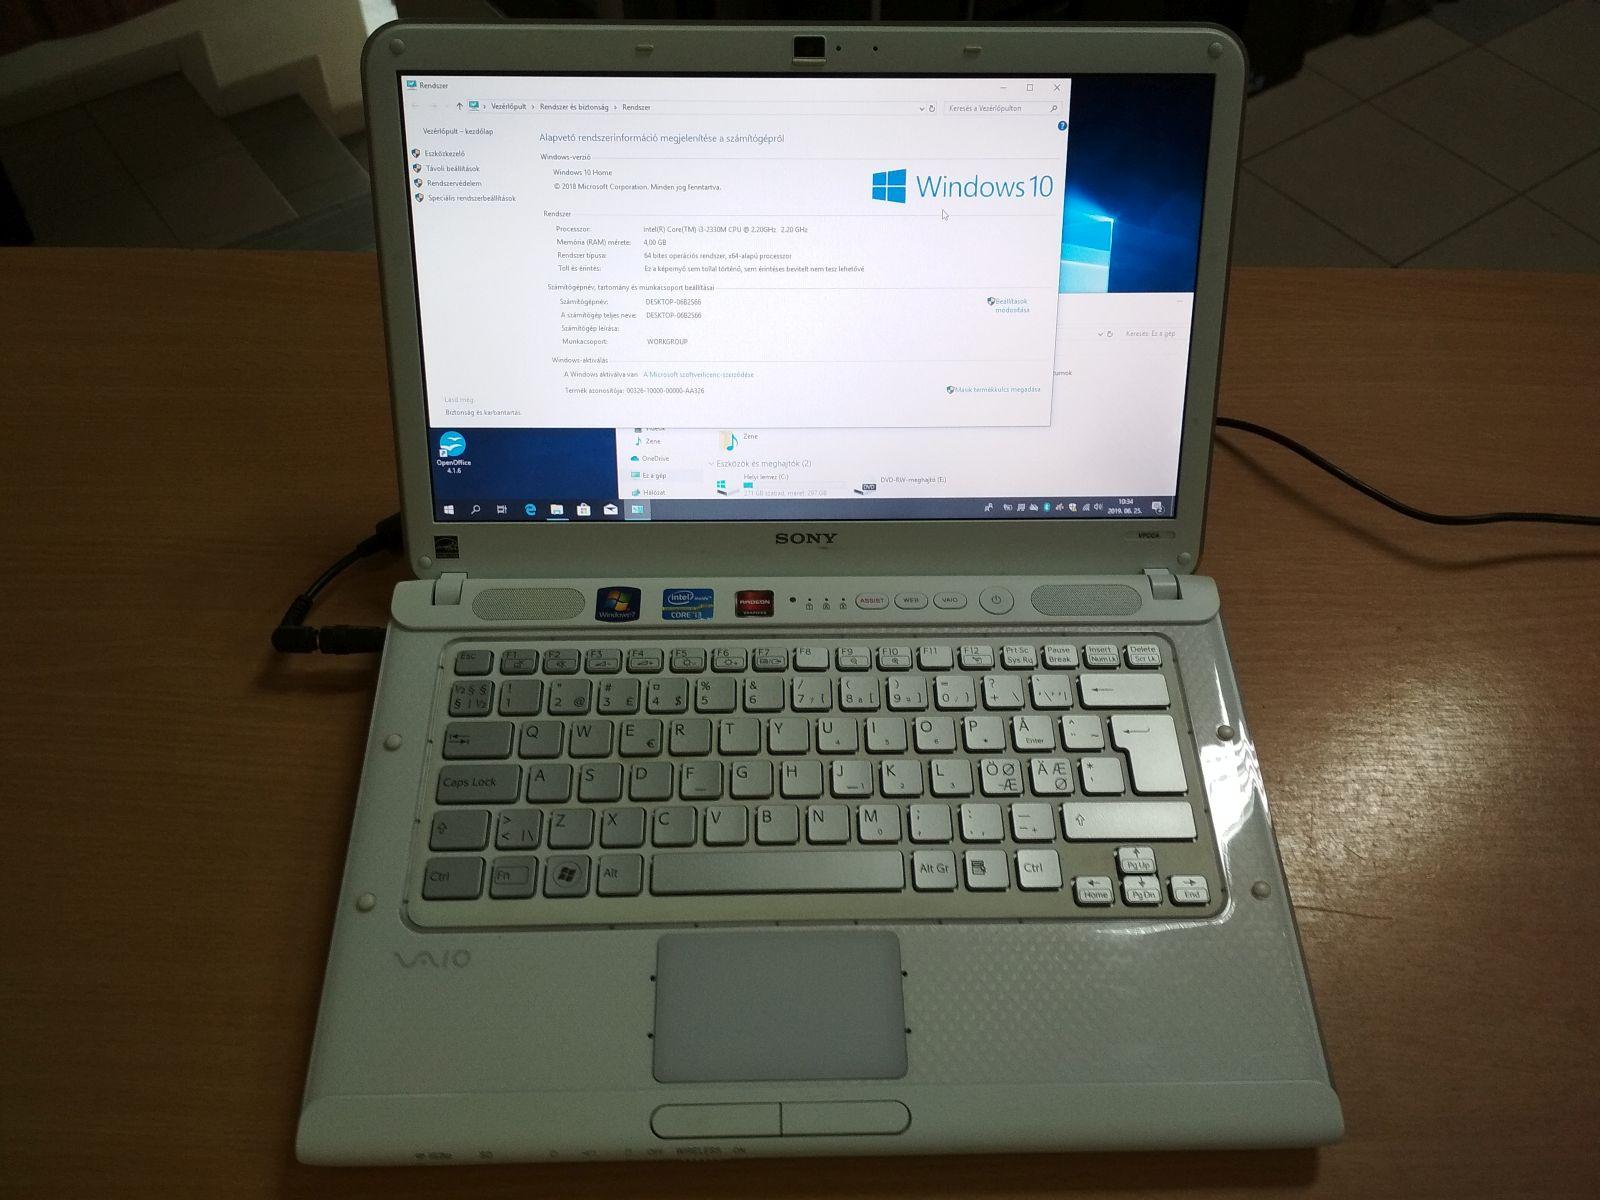 Sony Vaio VPCCA3S1E Intel i3 / 4GB / 320GB HDD használt 3 hó gar!